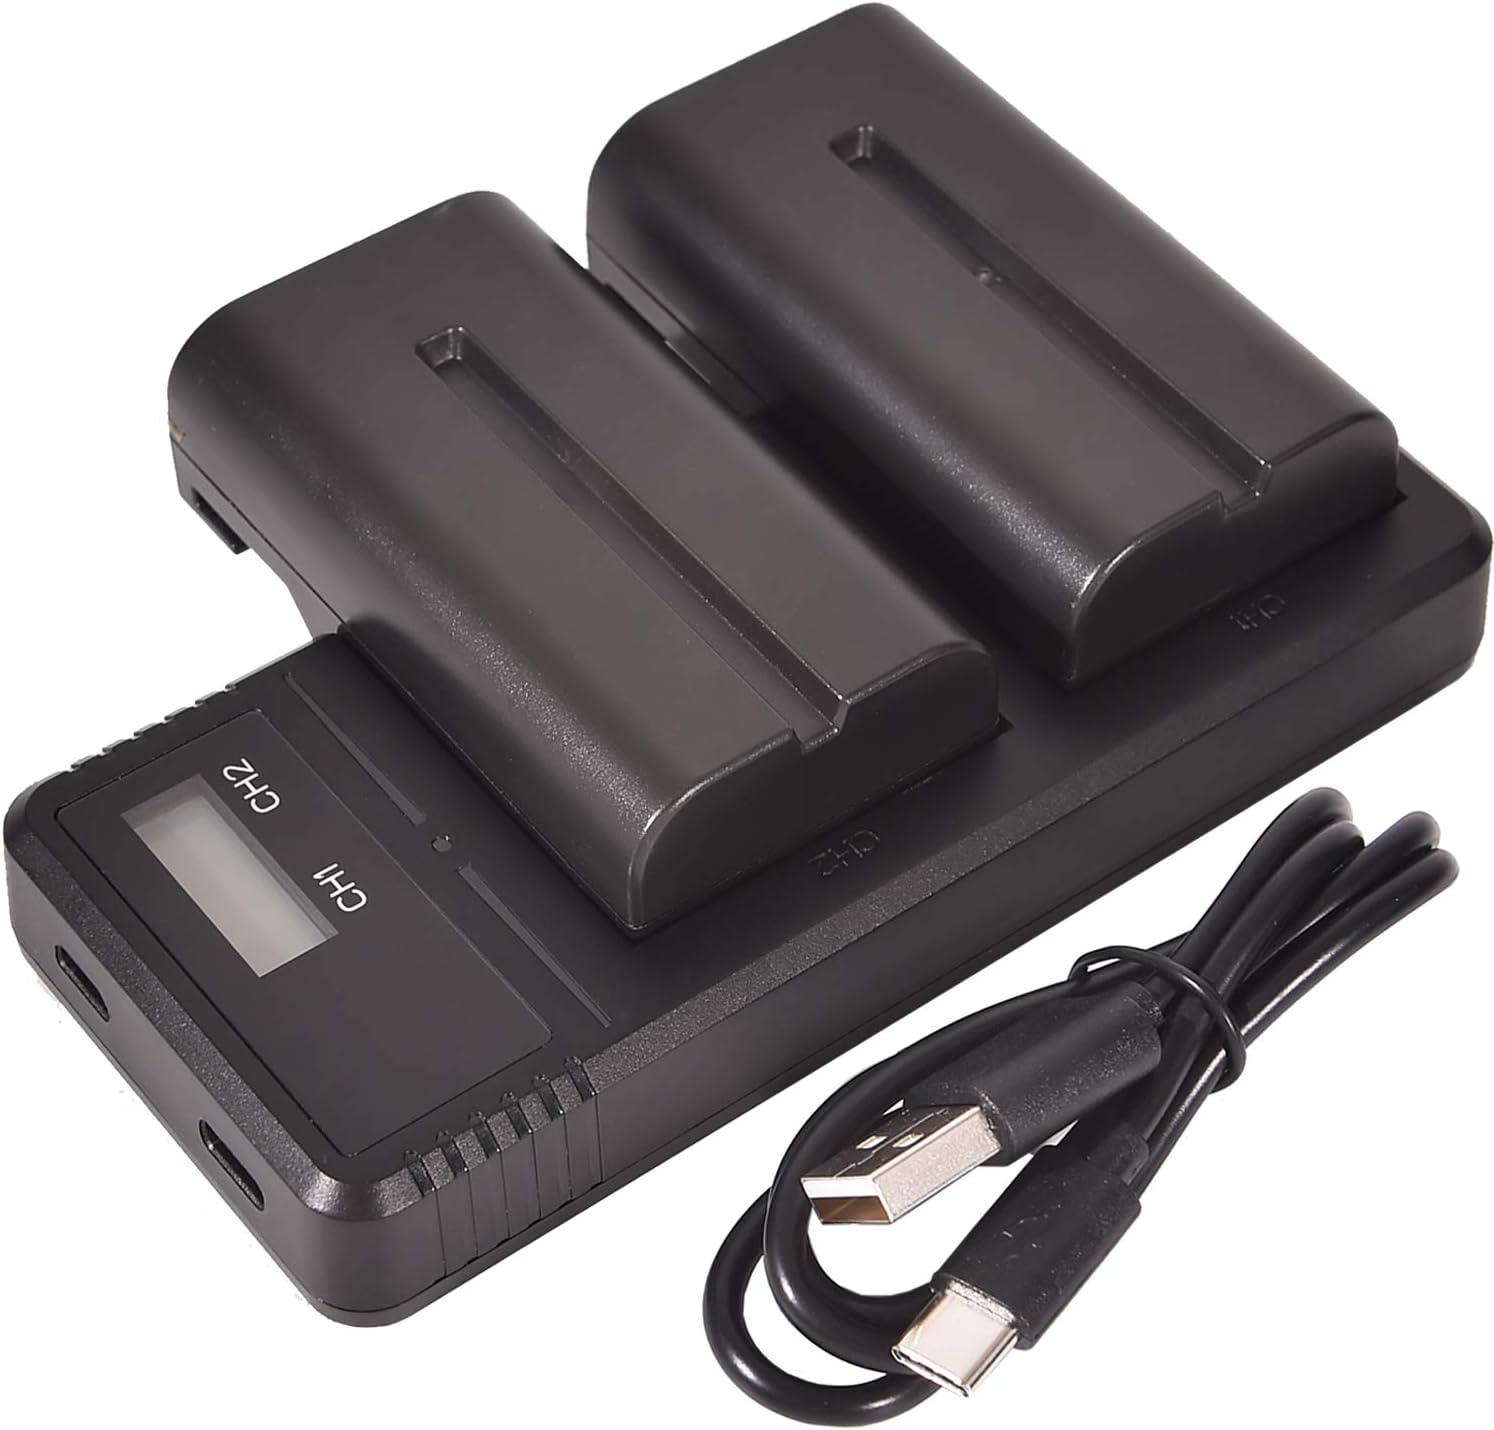 2 Pack CCD-SC5 CCD-SC6 Cargador LCD Dual de Carga r/ápida Compatible para NP-F330 CCD-SC55E CCD-RV200 CCD-SC5//E CCD-SC55 NP-F550 DSTE Repuesto Bater/ía NP-F570 y Sony CCD-RV100 NP-F530